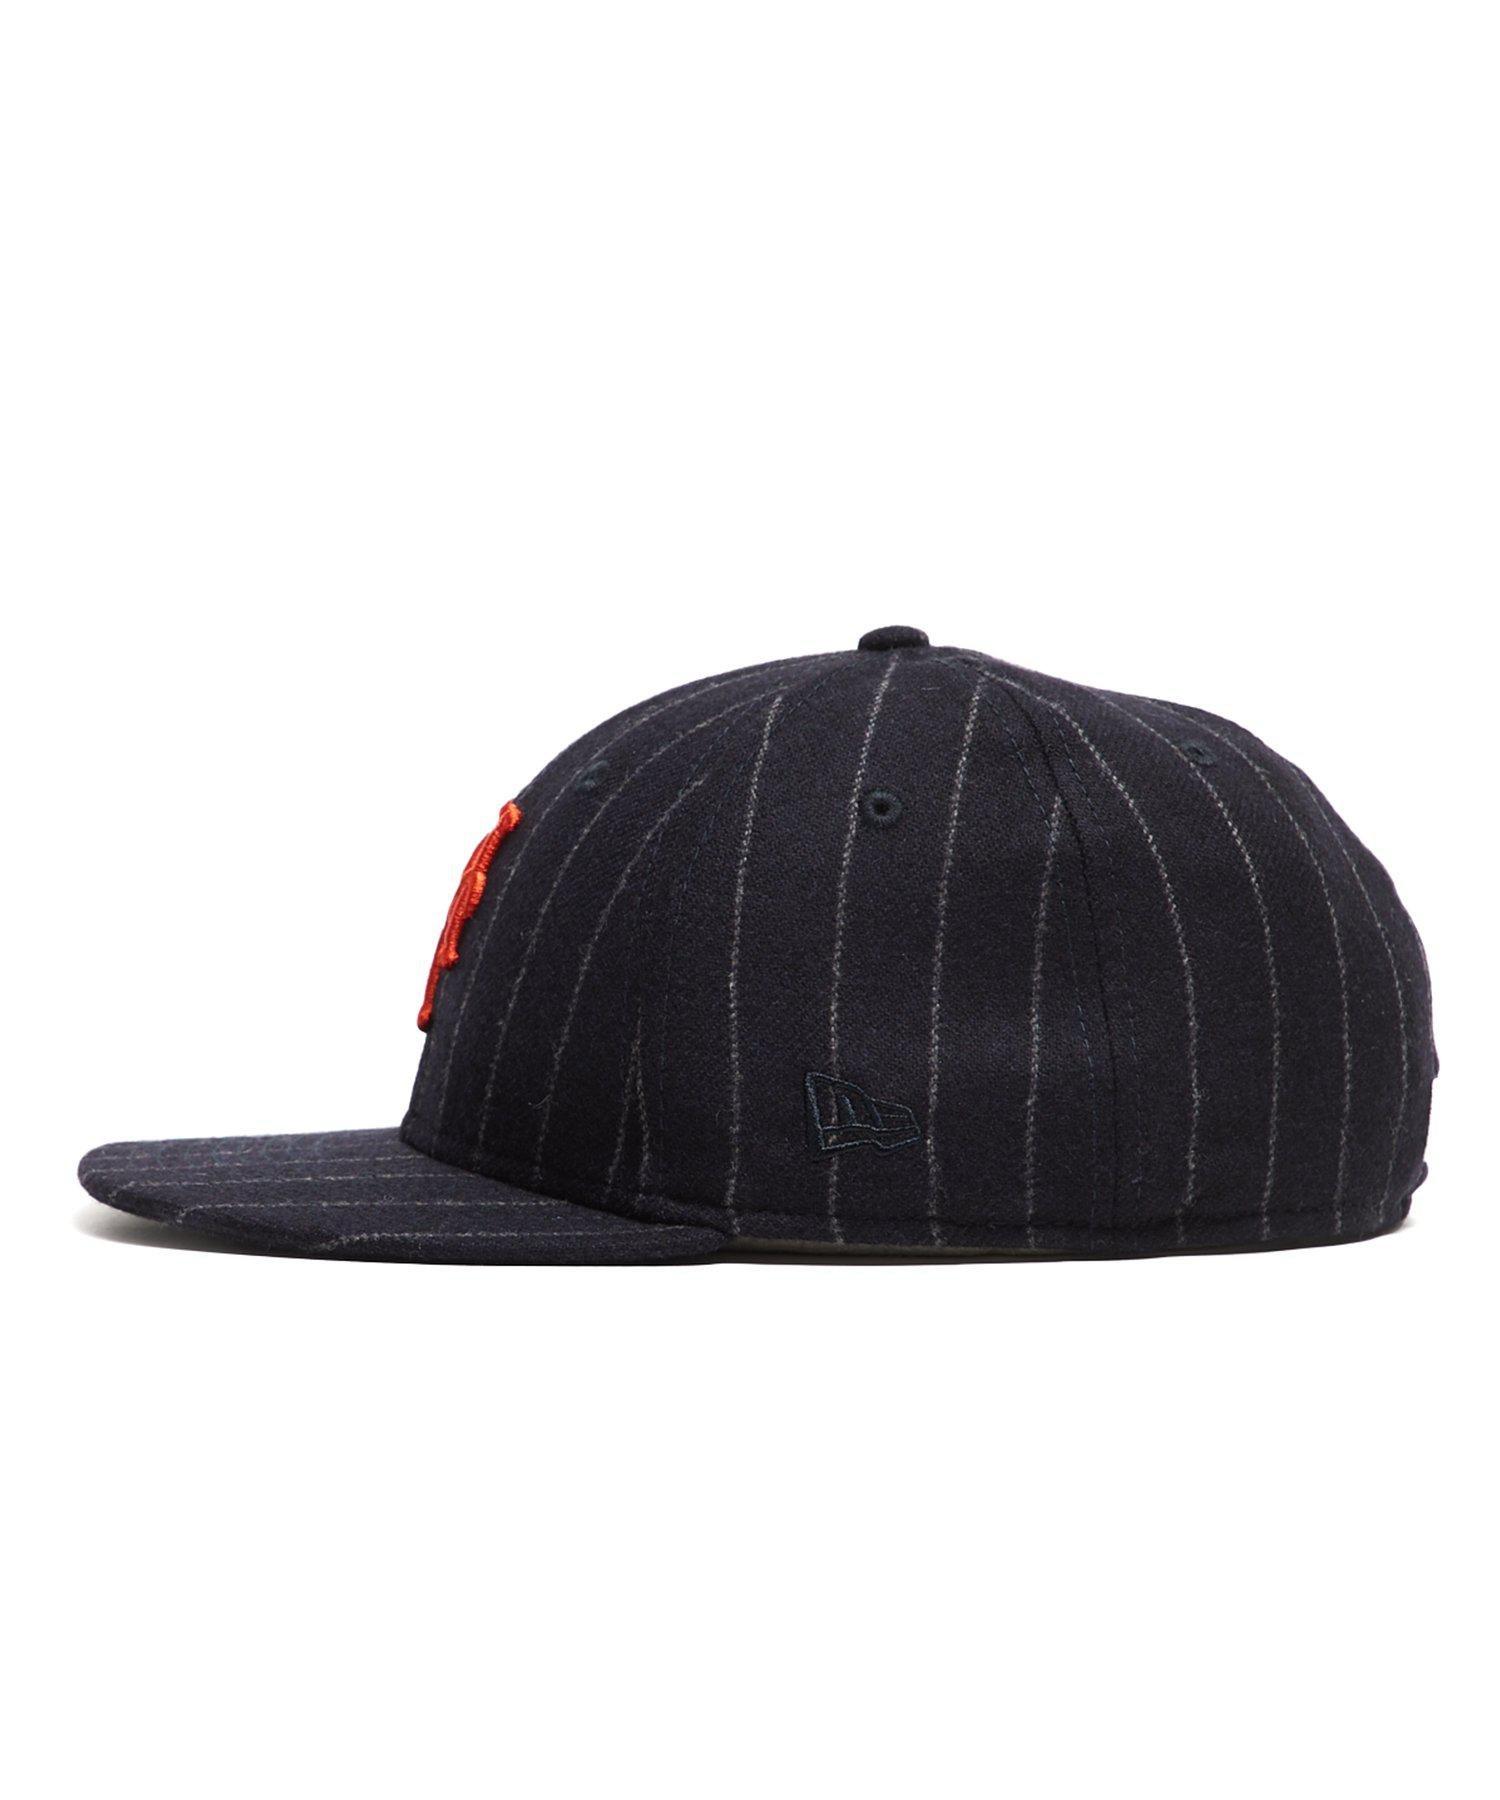 NEW ERA HATS Exclusive New Era New York Mets Cap In Abraham Moon Navy Wool  Chalkstripe in Blue for Men - Lyst 98ab2dcbe2f6